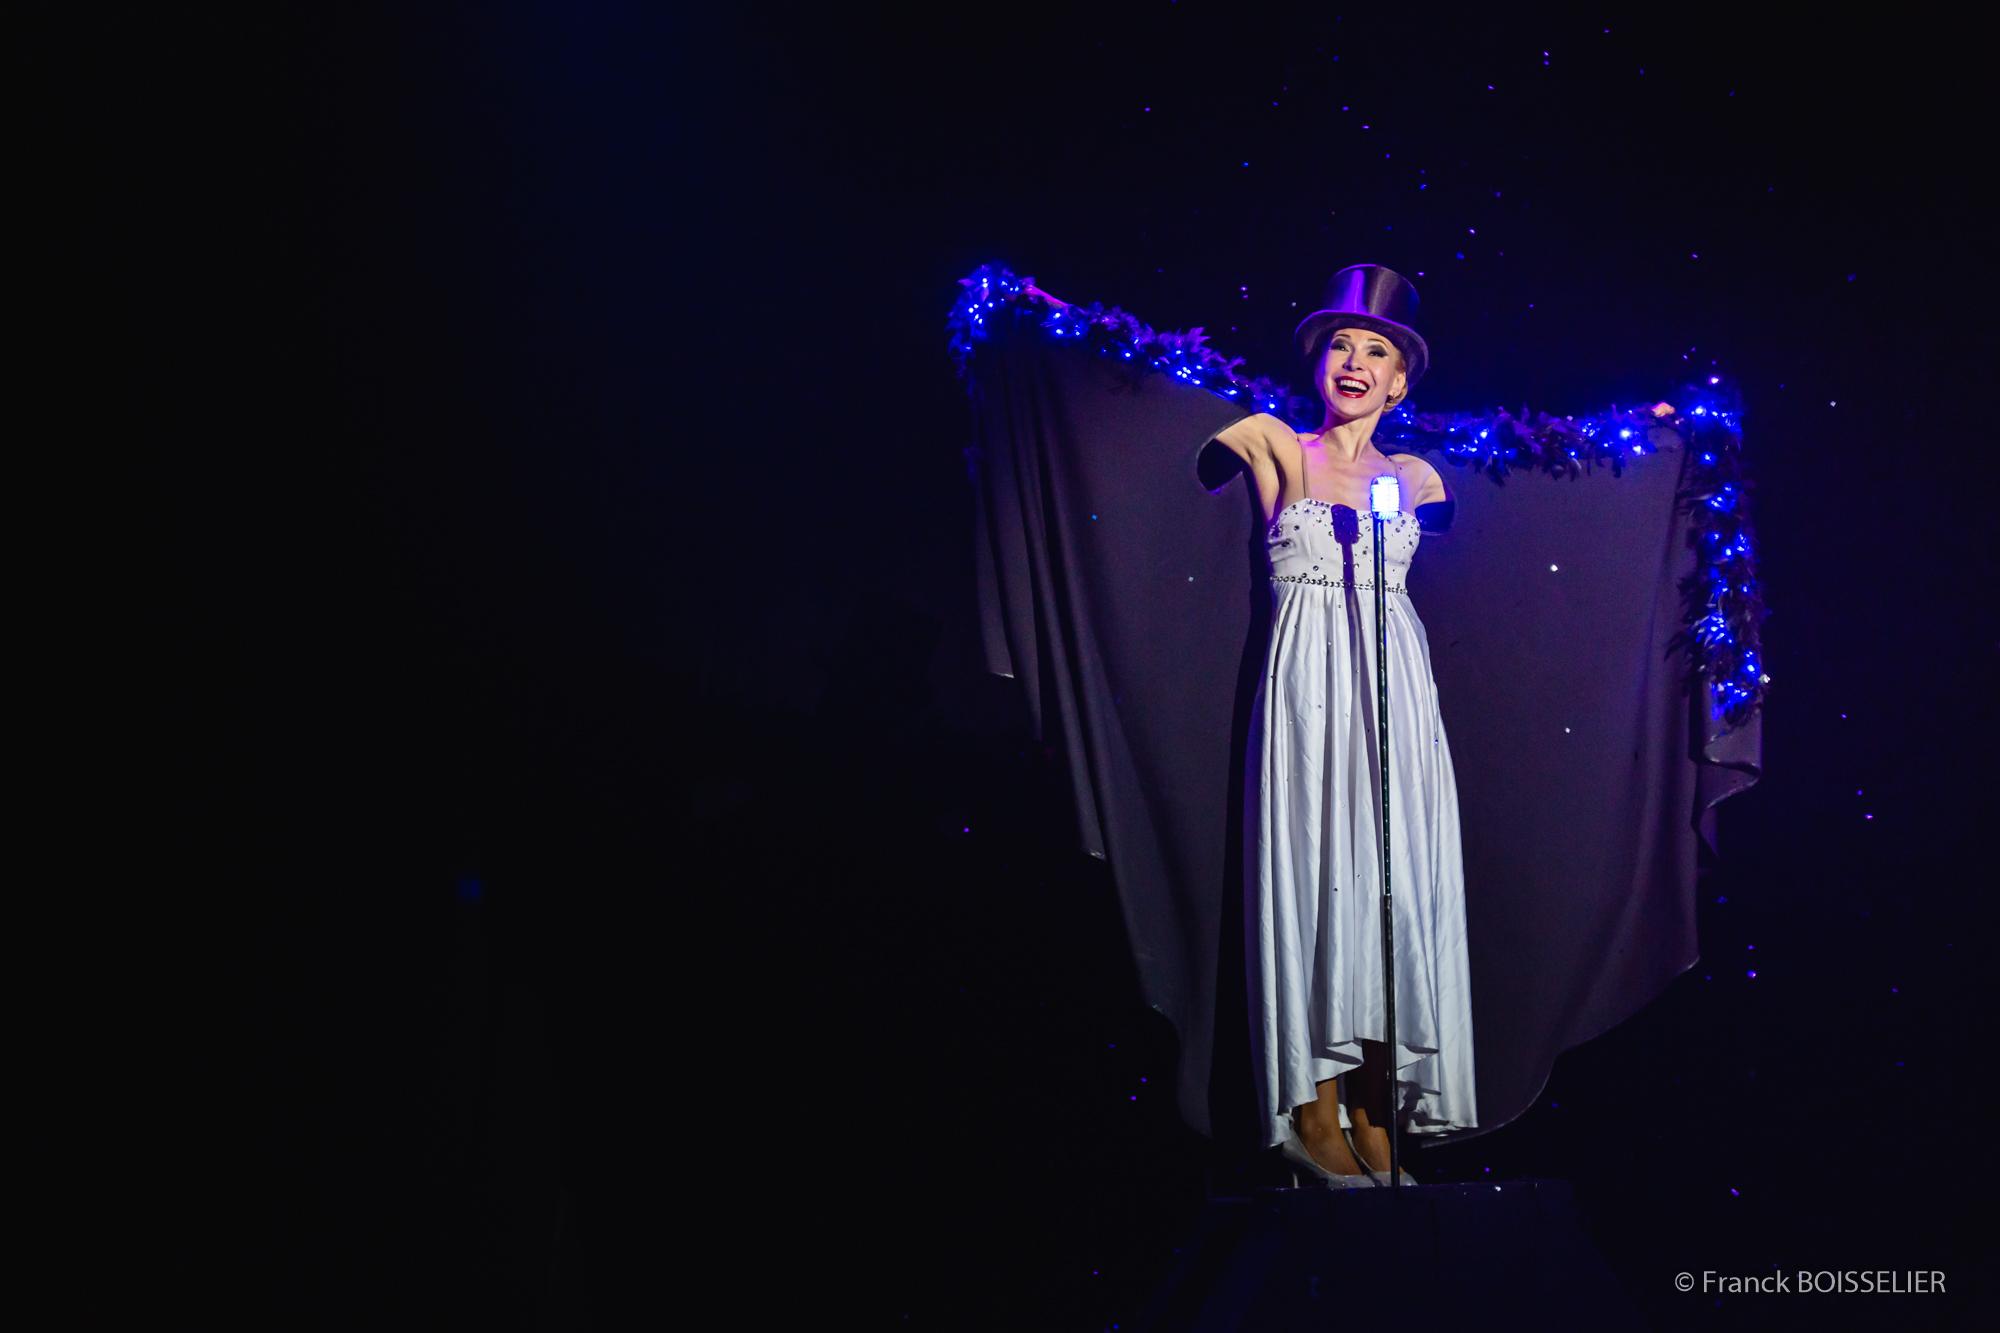 Festival International de magie - Franck Boisselier Photographe Spectacle